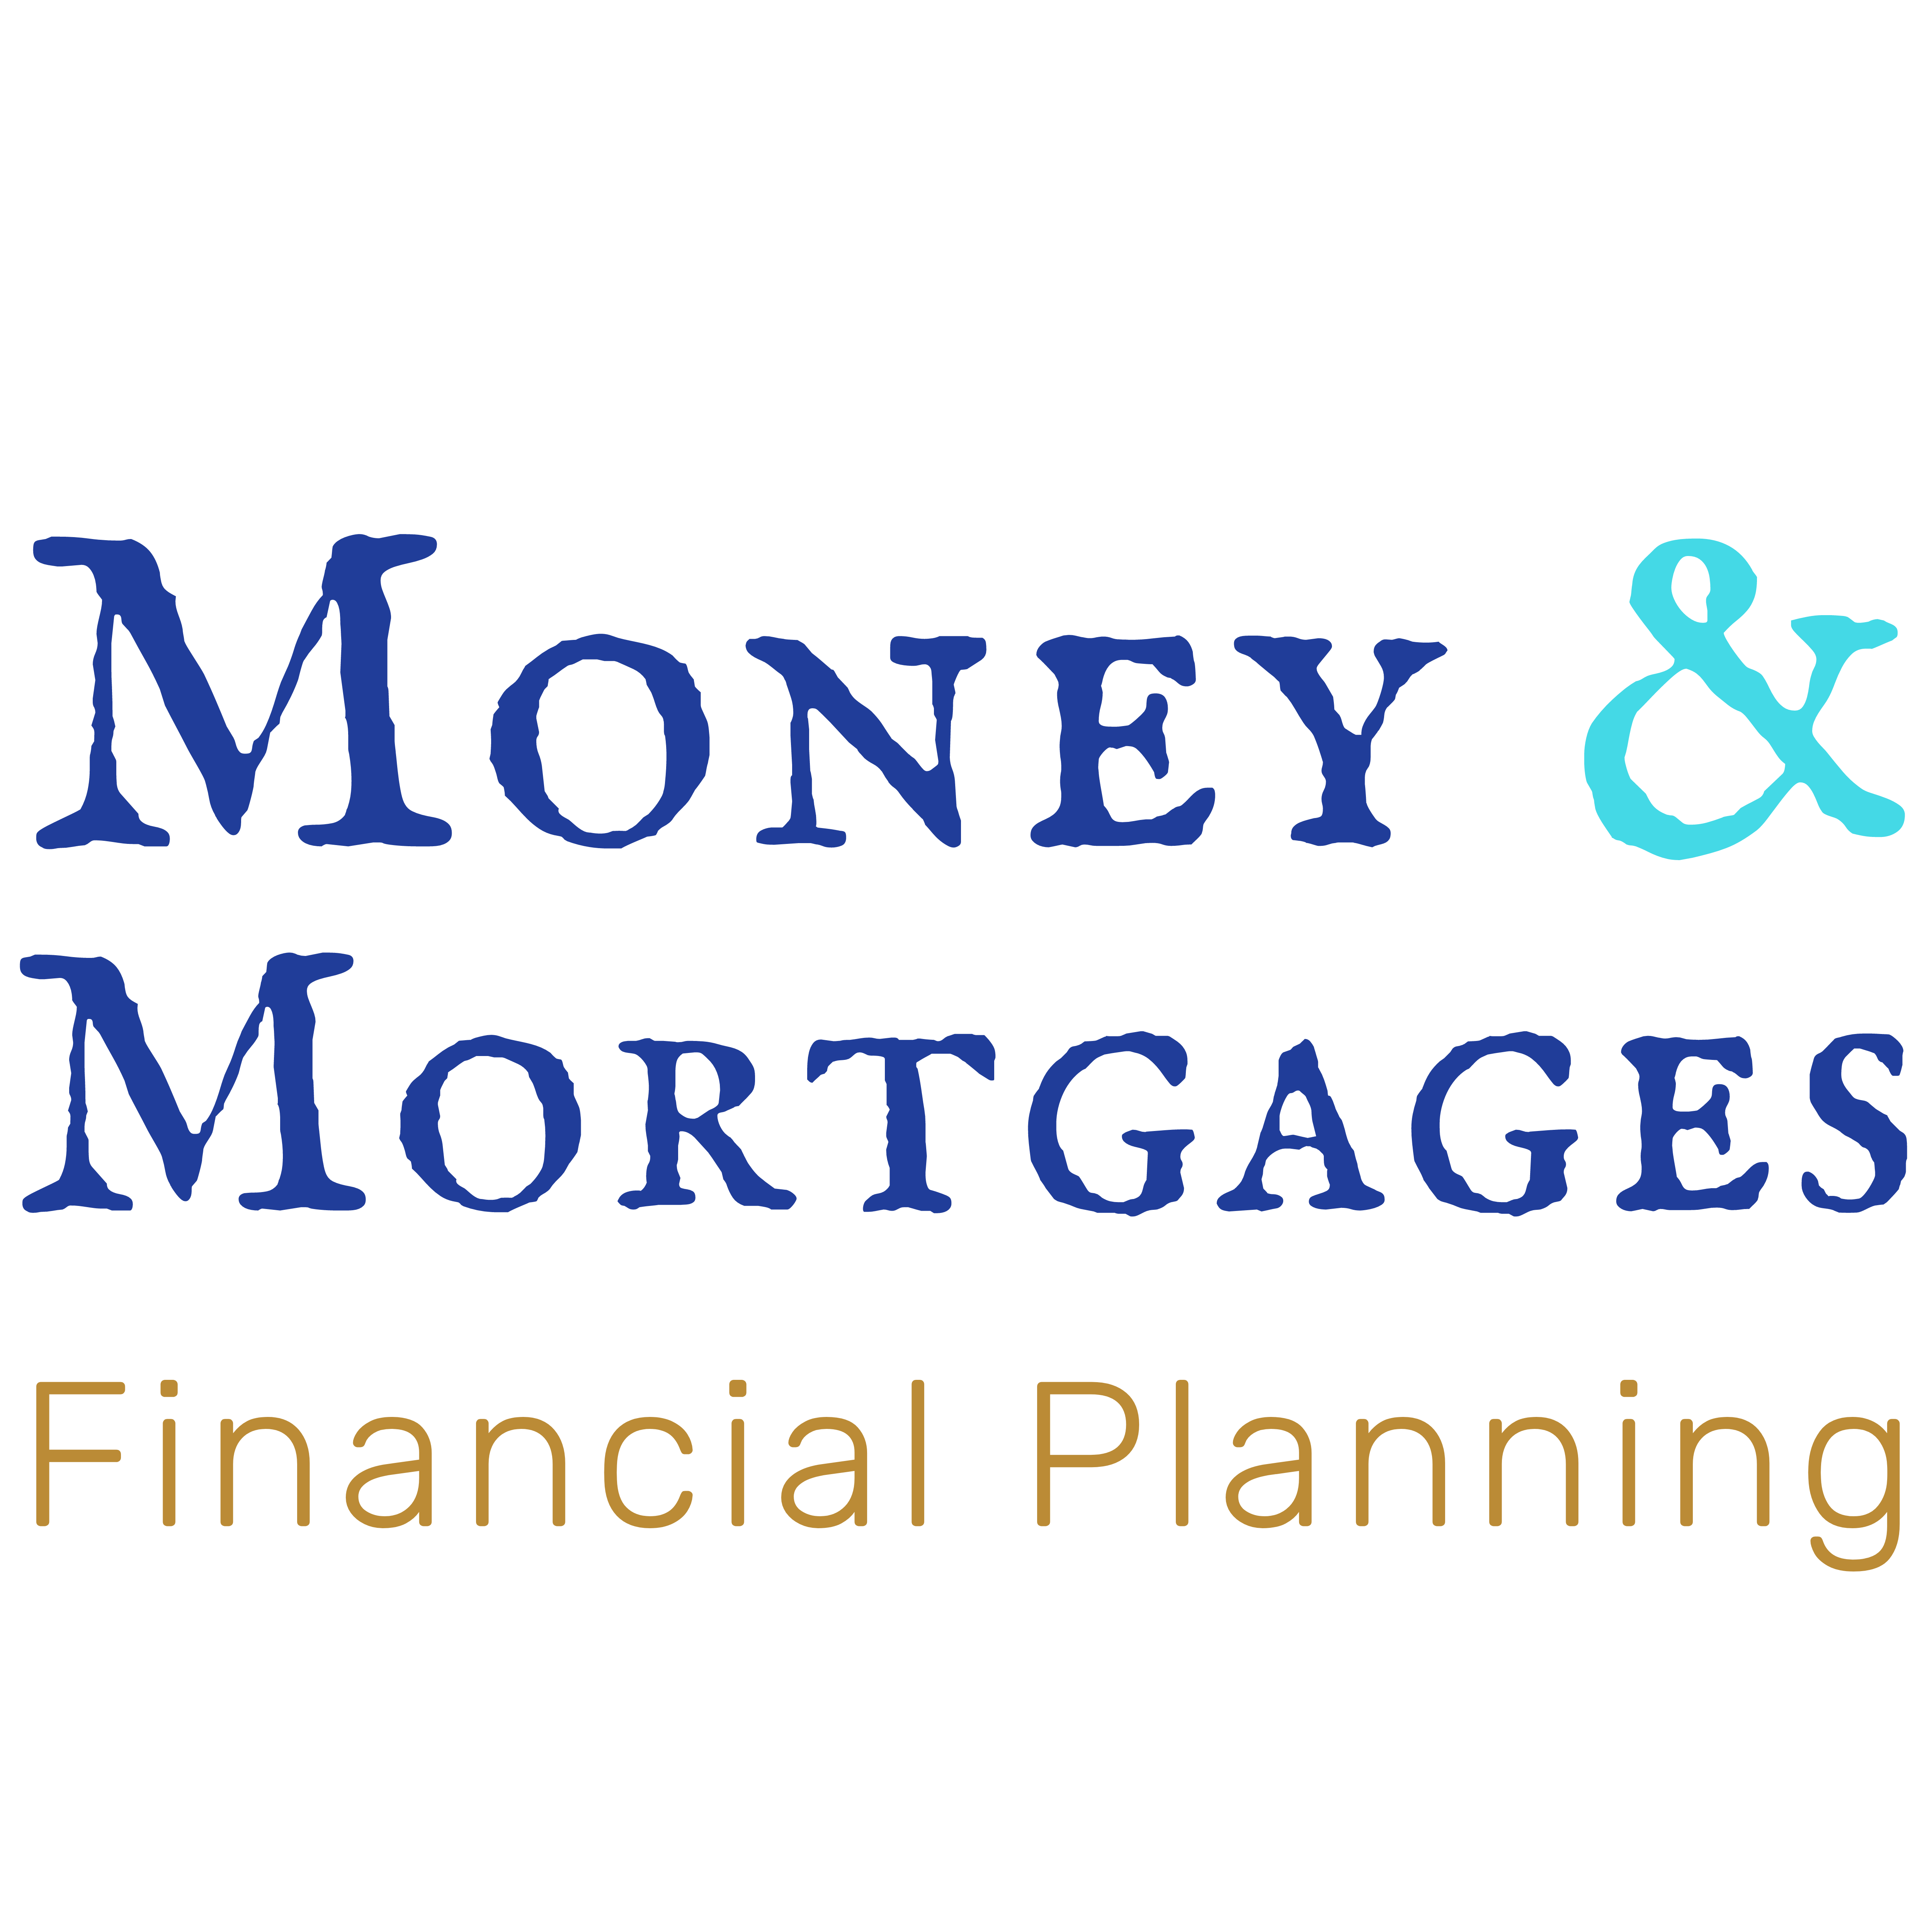 Money & Mortgages UK LLP